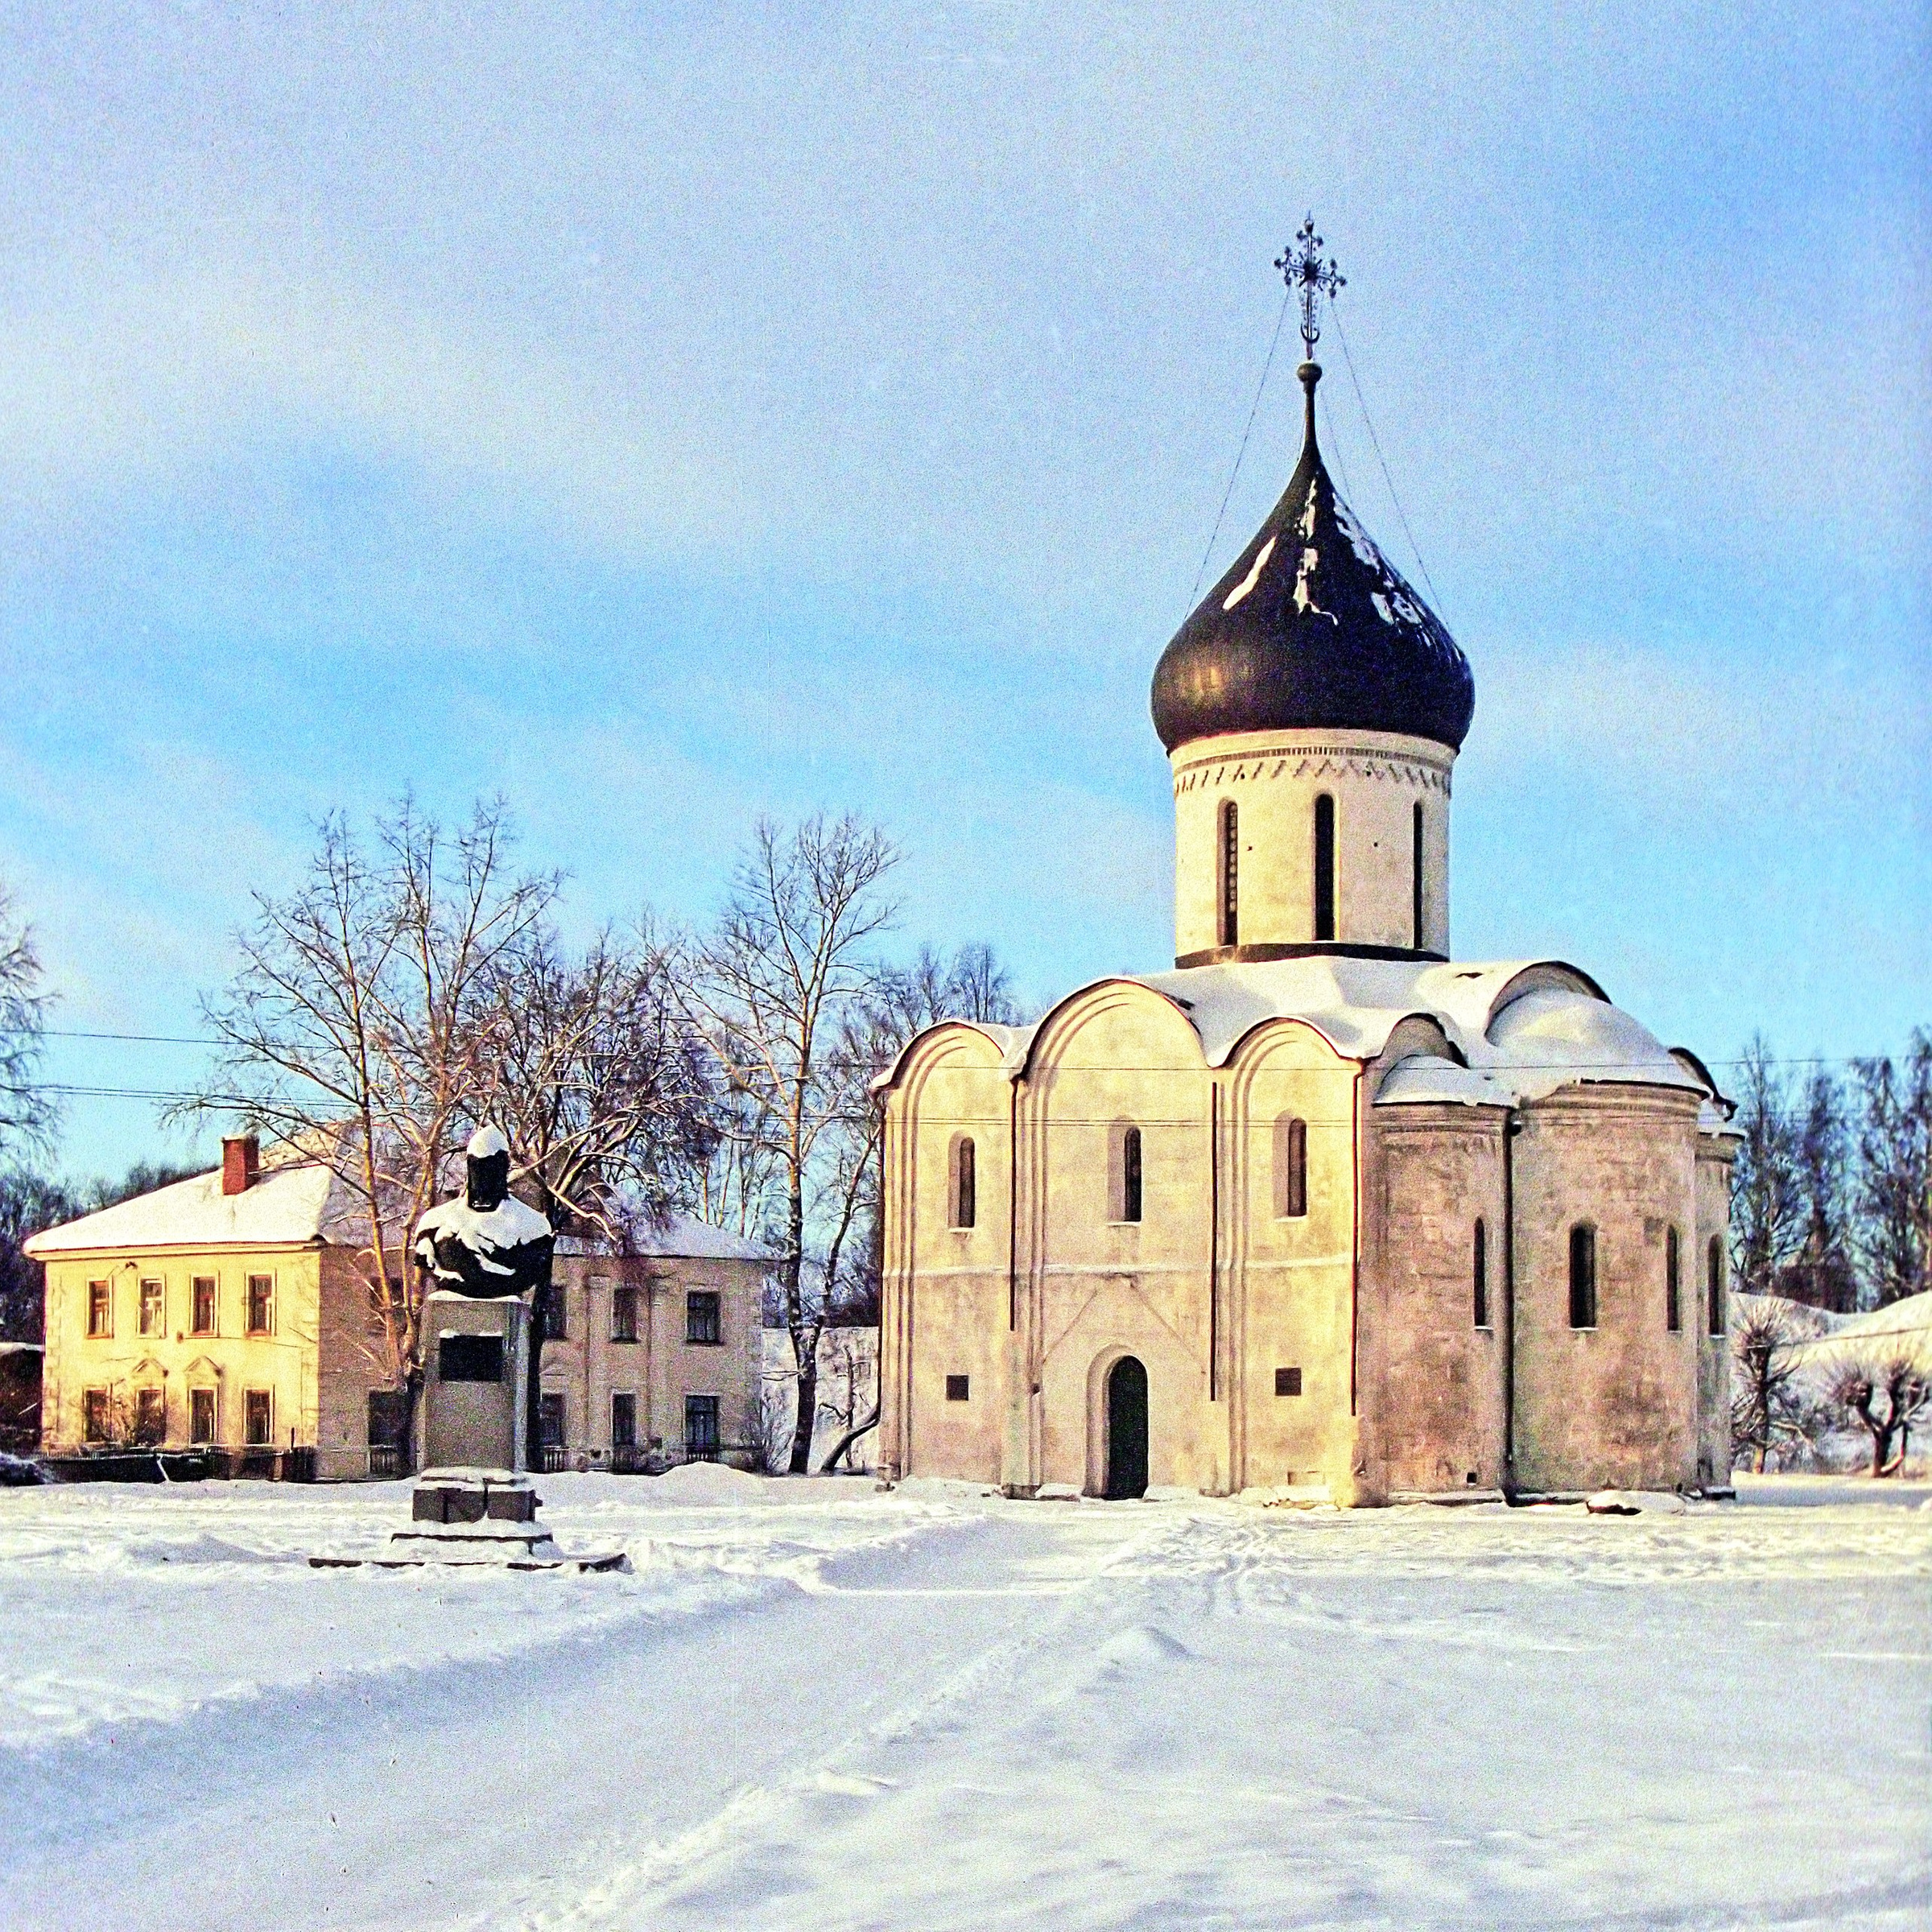 Спасо-Преображенский собор в Переславле-Залесском.  Фото © Wikipedia